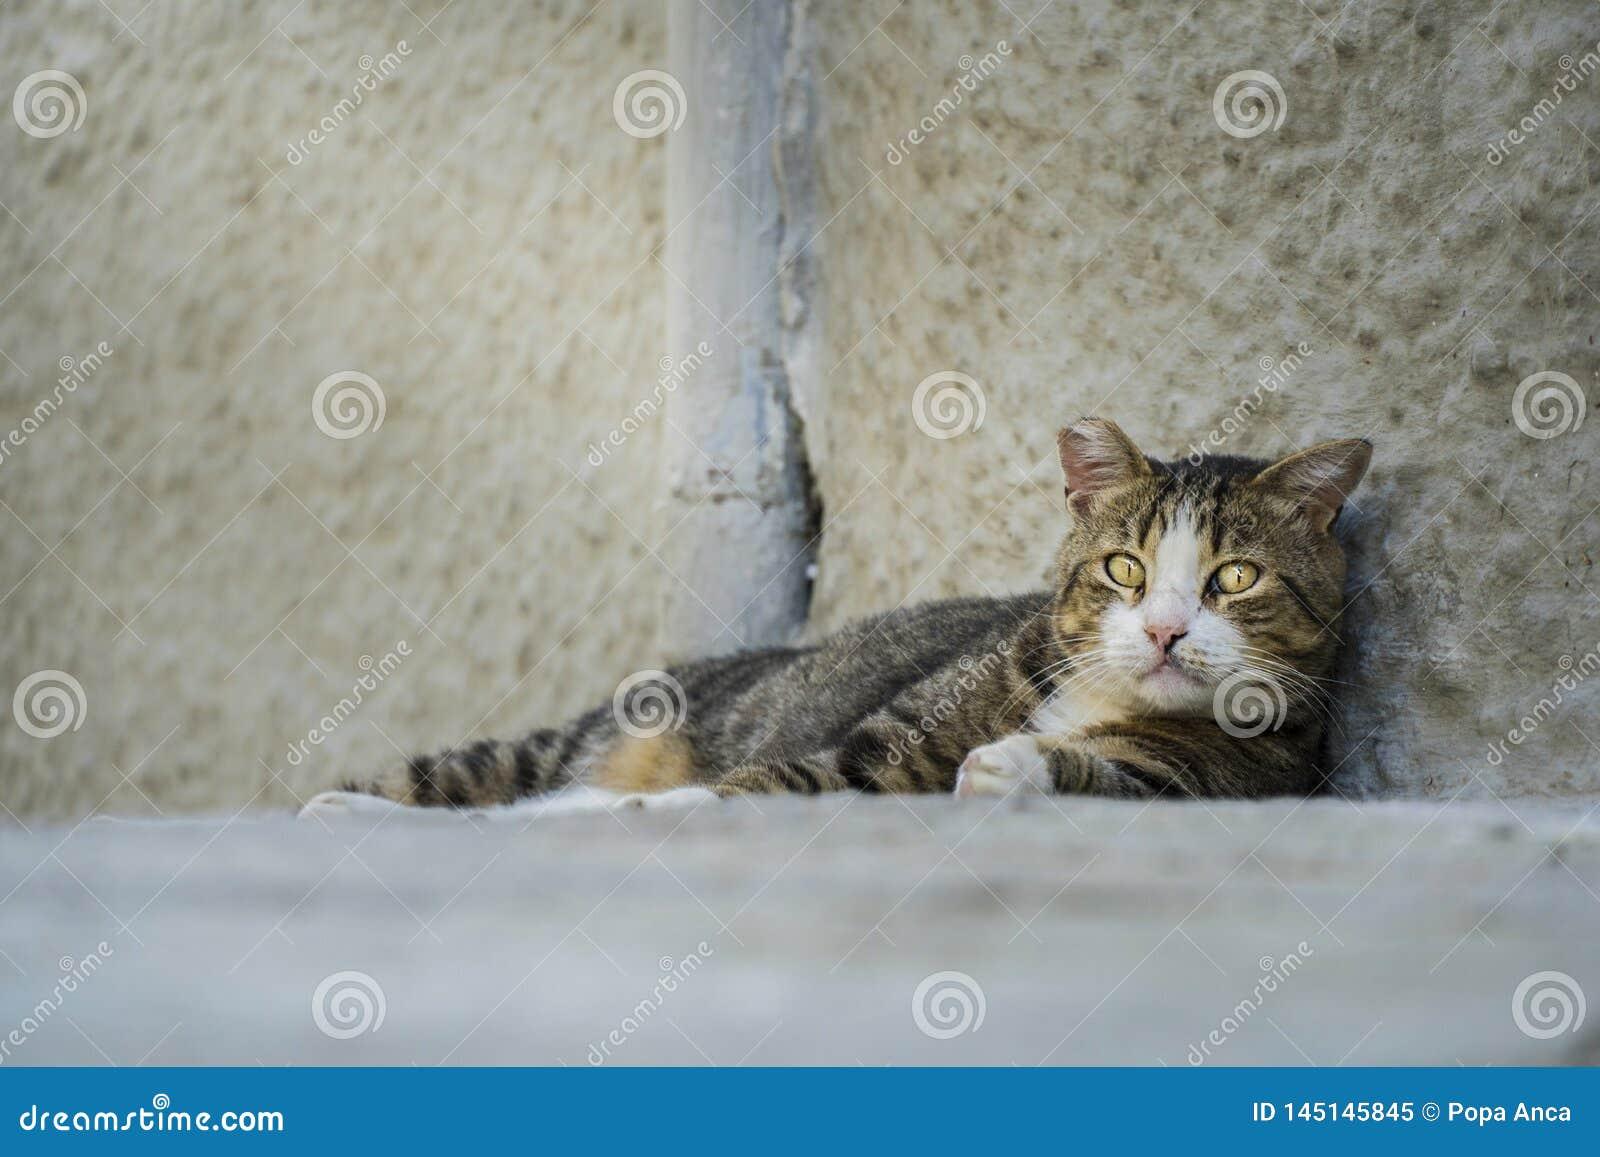 Adult abandoned stray cat looking sad at the camera